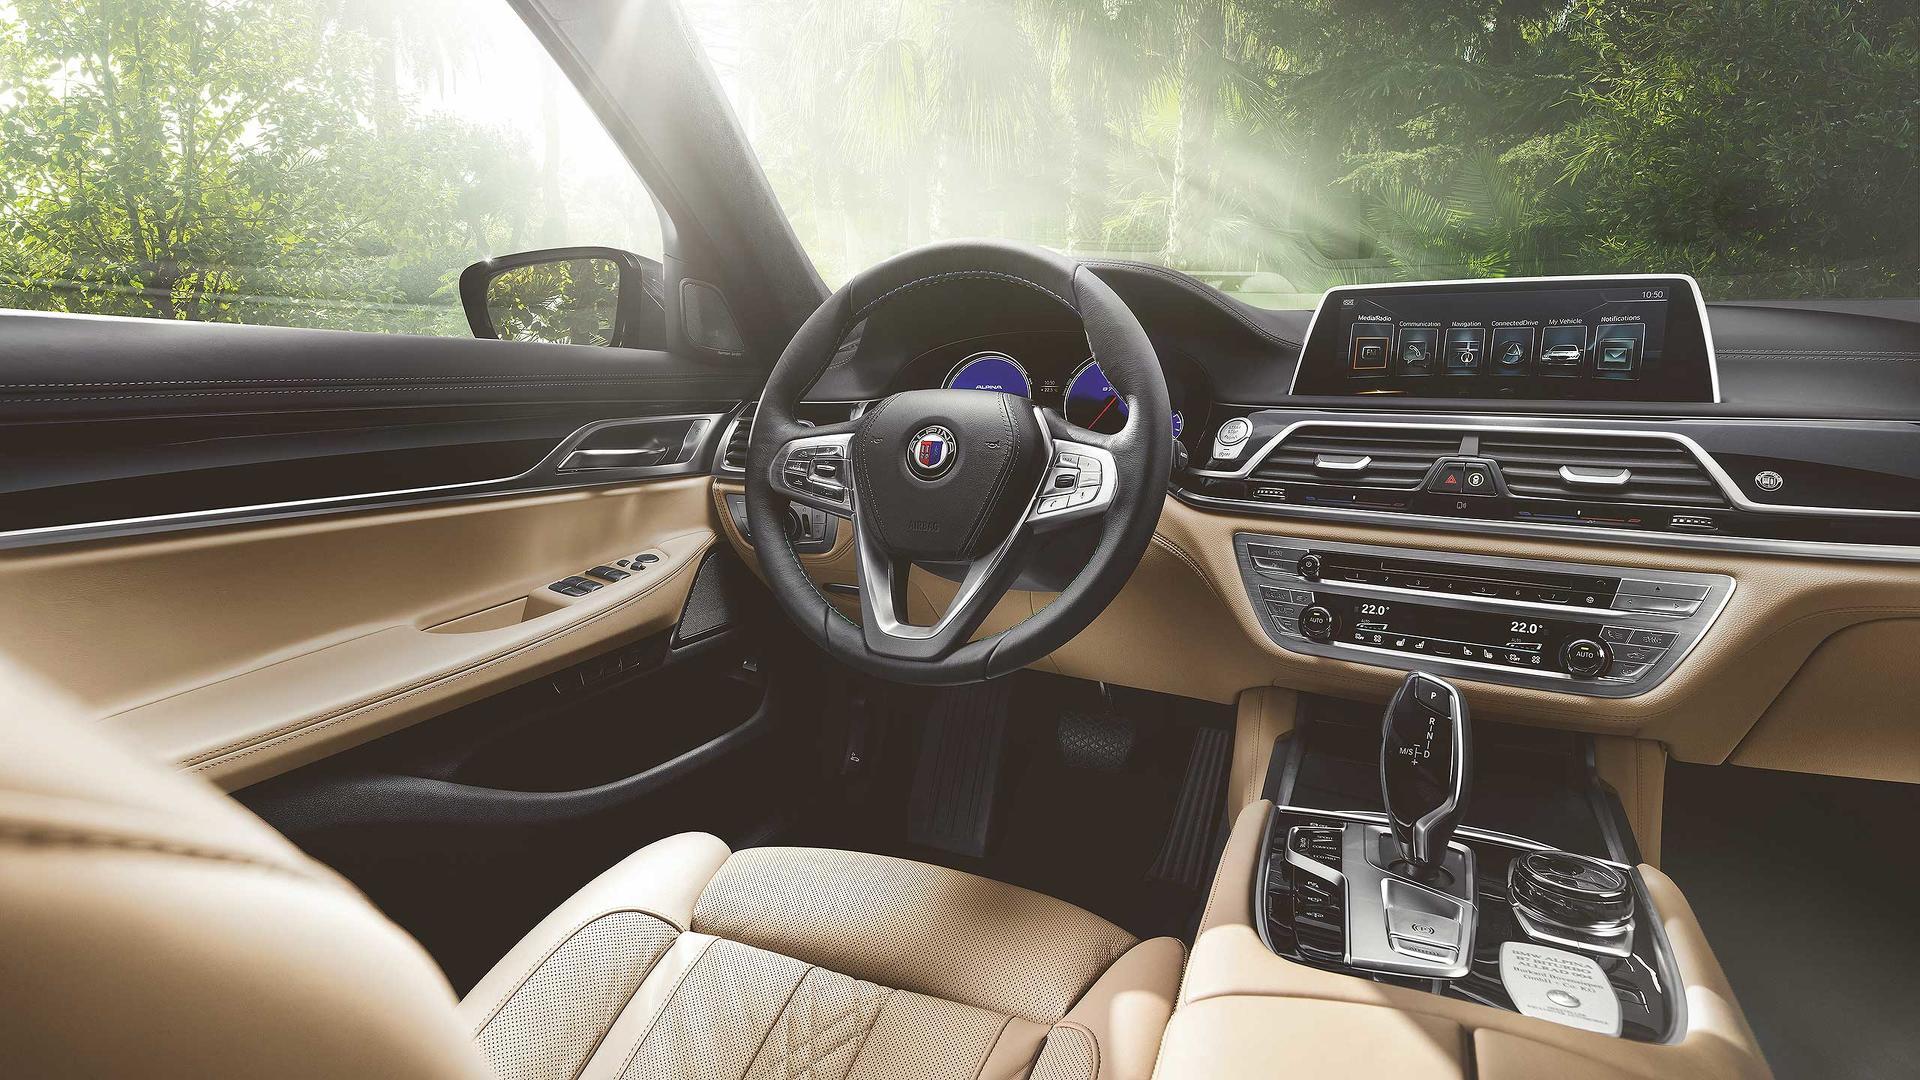 Mph Alpina BMW Series On Sale In UK - Bmw 750i alpina price